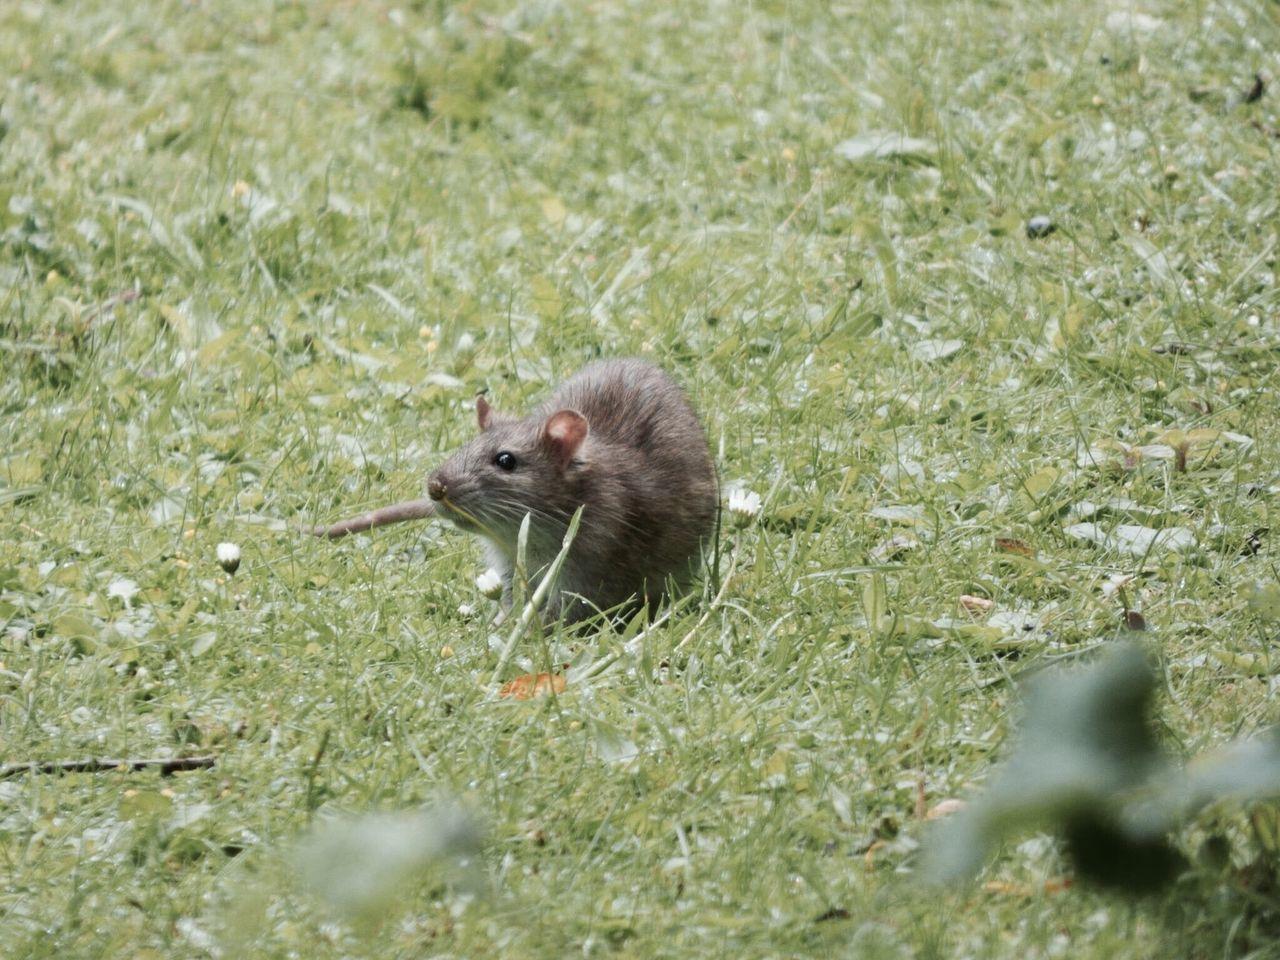 rats are beautiful One Animal Animals In The Wild Animal Wildlife Mammal Outdoors Rat